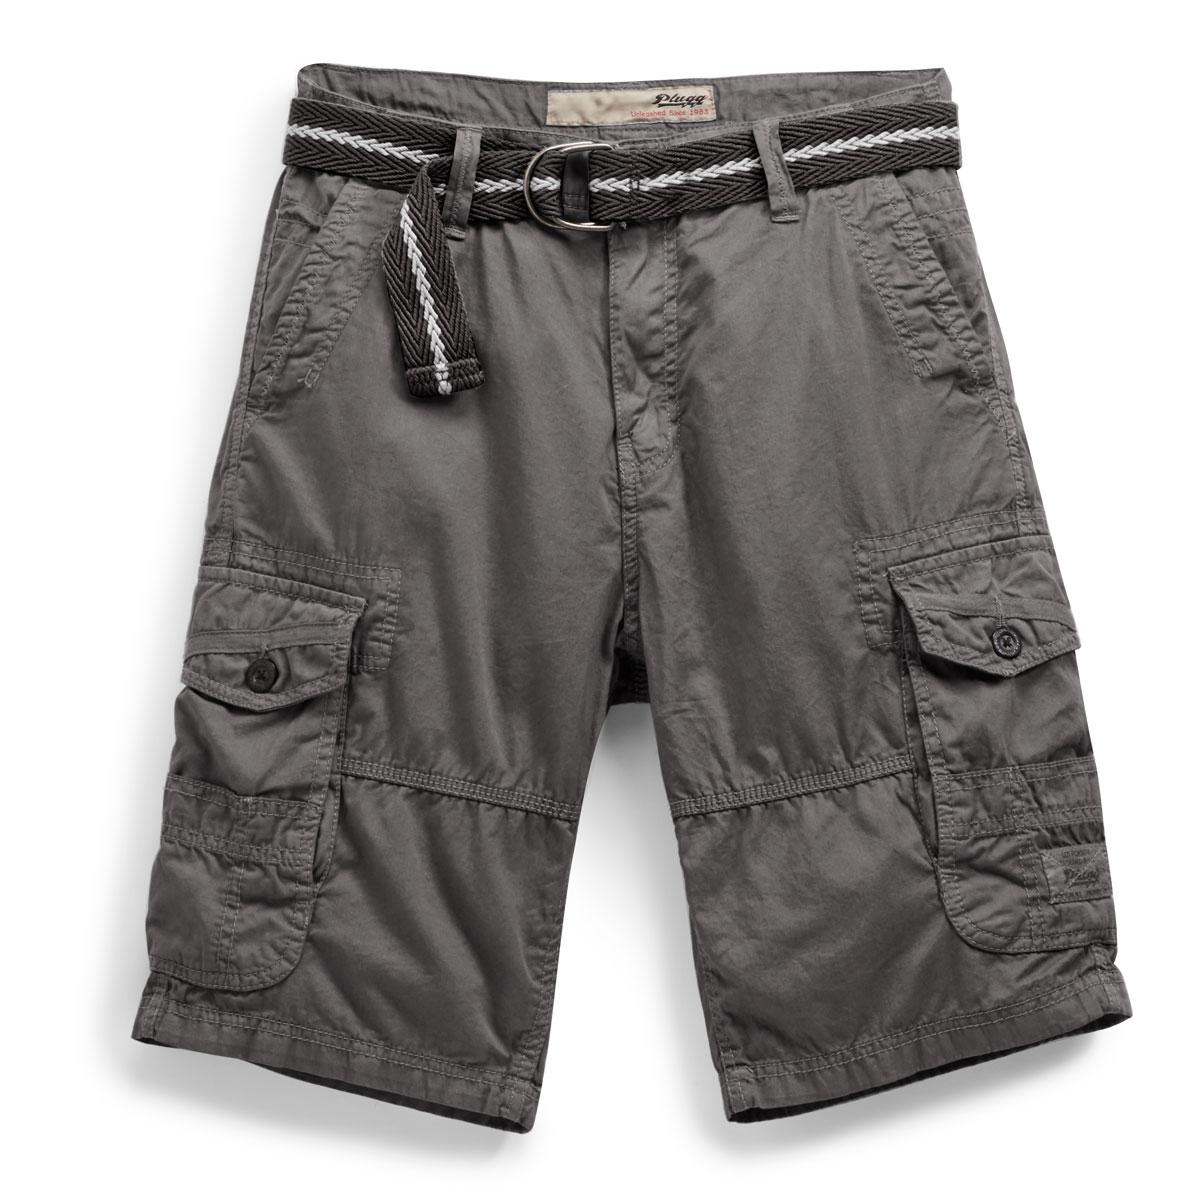 Plugg Guys' Fiction Lightweight Twill Cargo Shorts - Black, 29